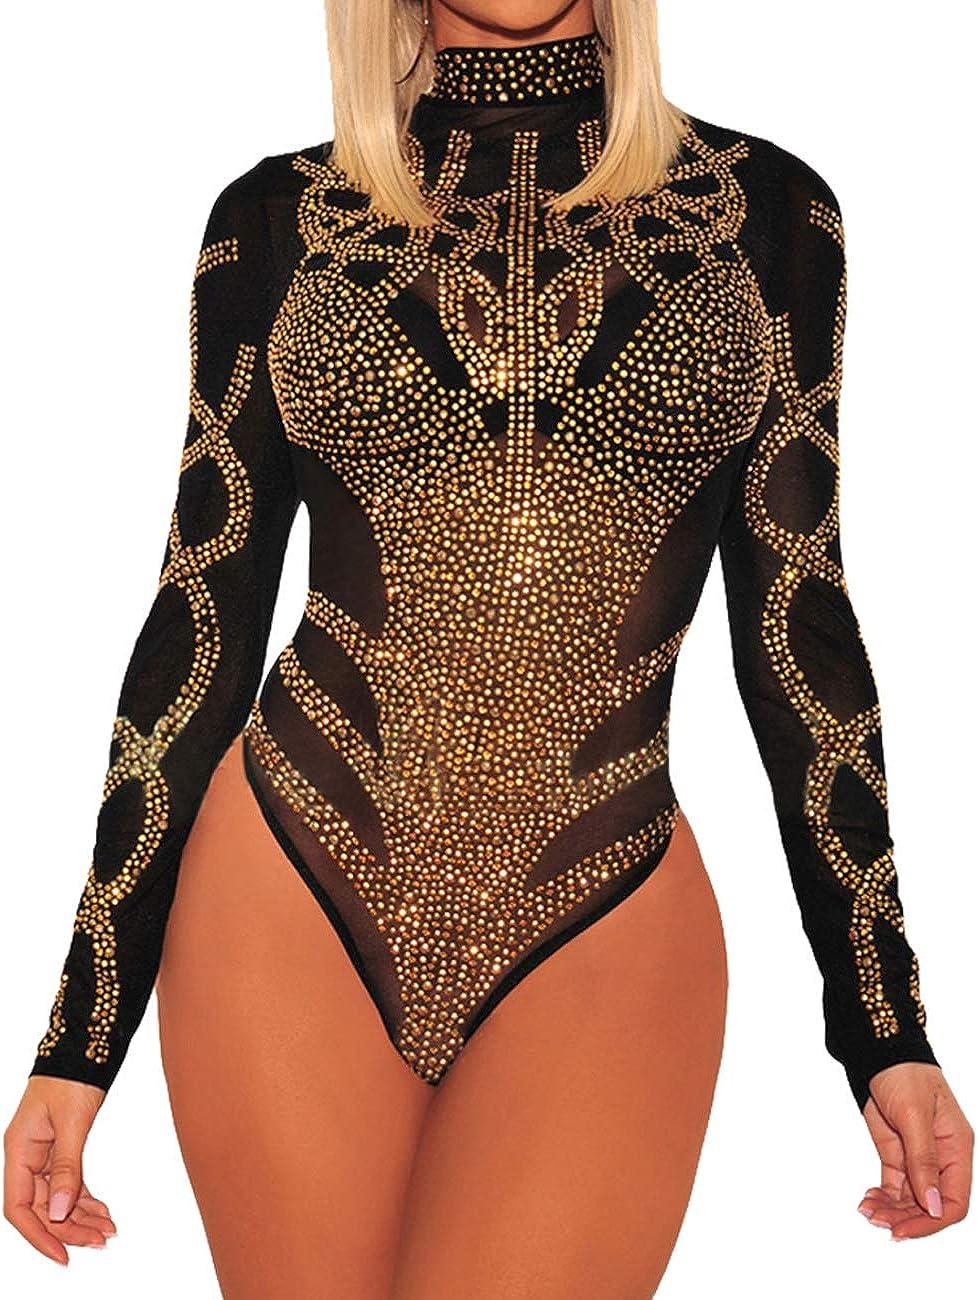 MAYFASEY Women's Long Sleeve Bodysuit Sheer Mesh Sexy Leotard Bodysuit Body Tops